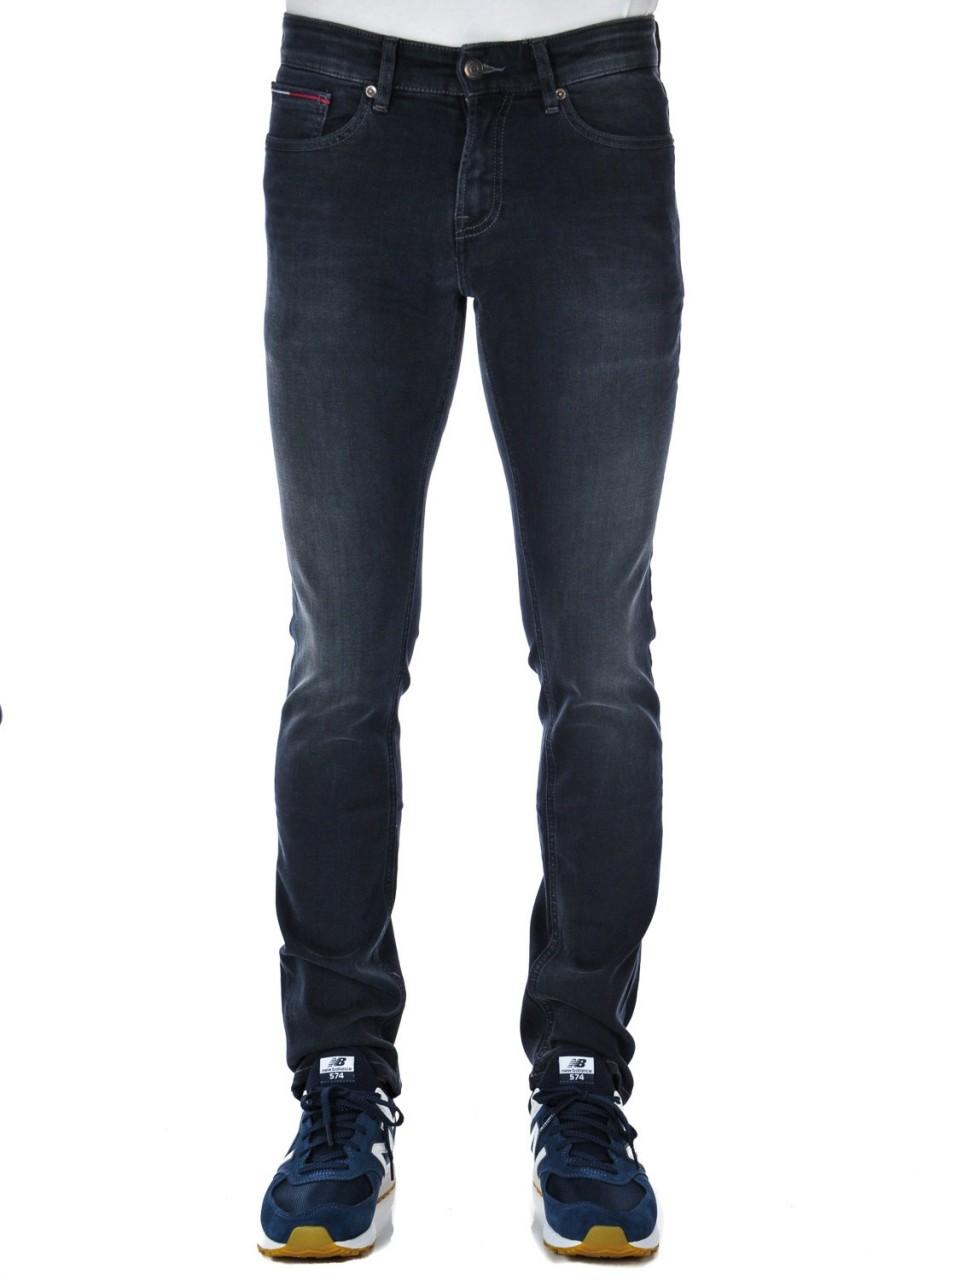 Tommy hilfiger Uomo Jeans Tommy Hilfiger Jeans Slim Scanton Dynamic 04597I